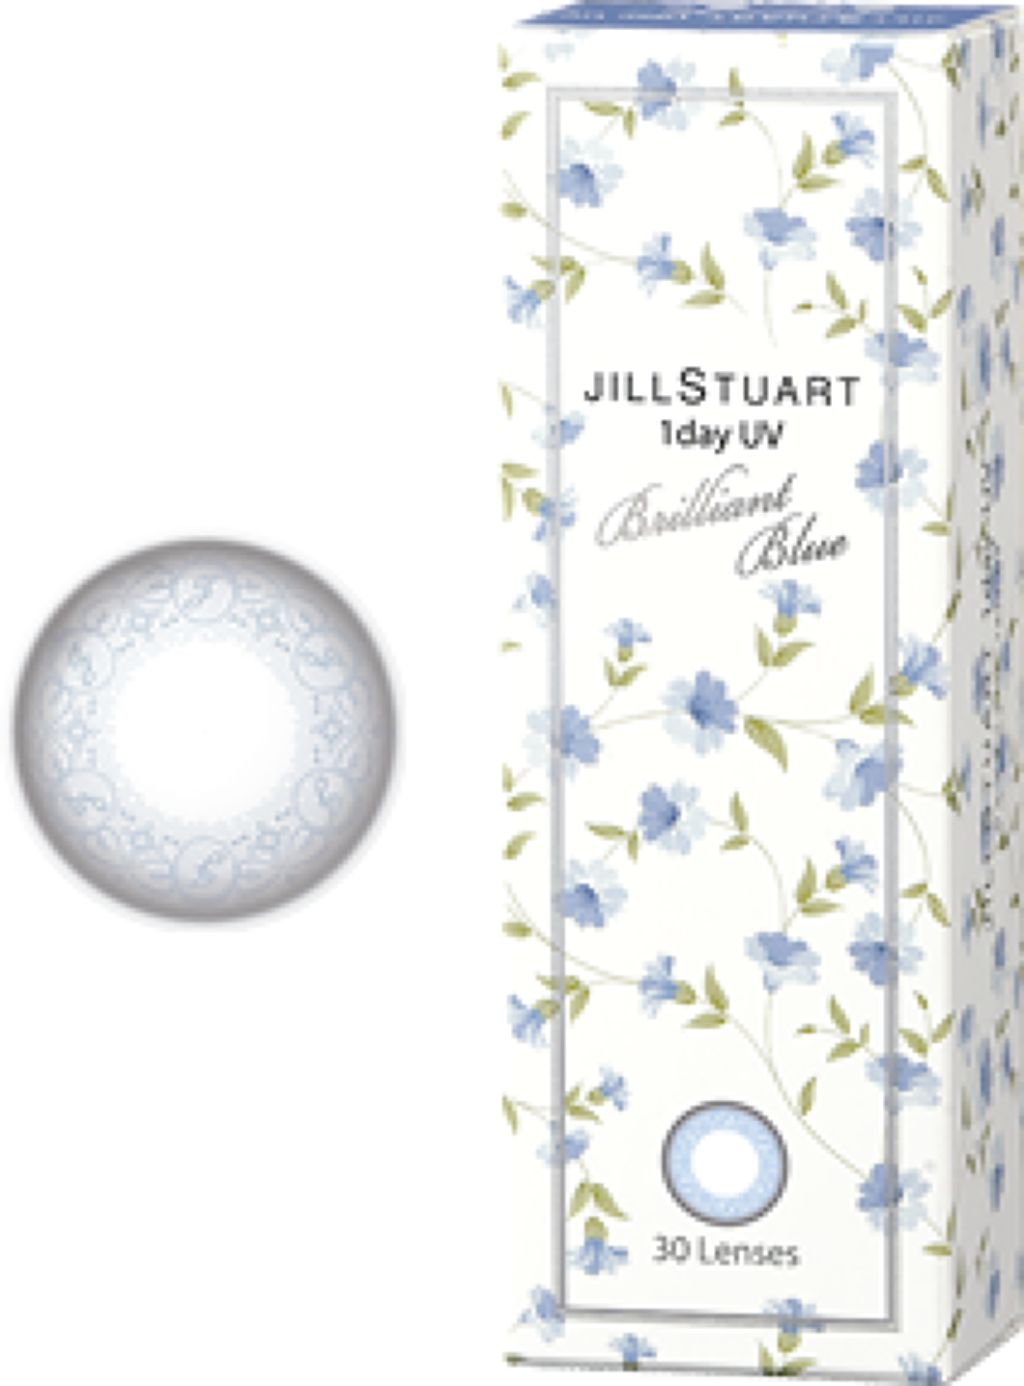 JILL STUART 1day UV ブリリアント ブルー